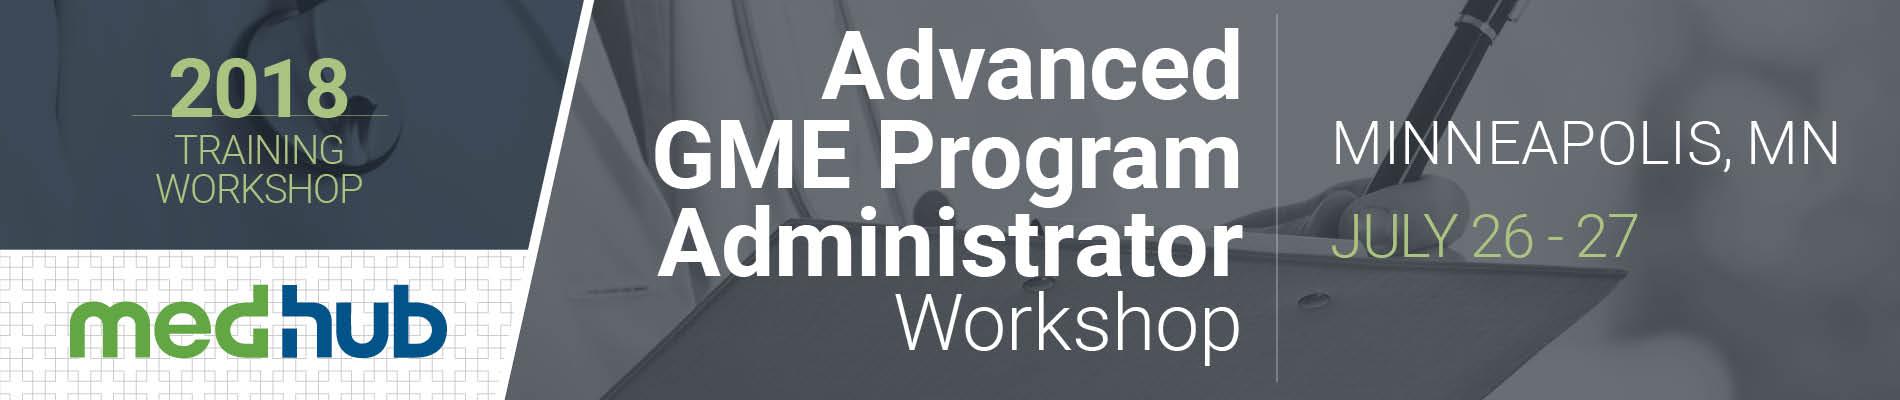 MedHub Advanced GME Program Administrator Workshop (July 26-27)